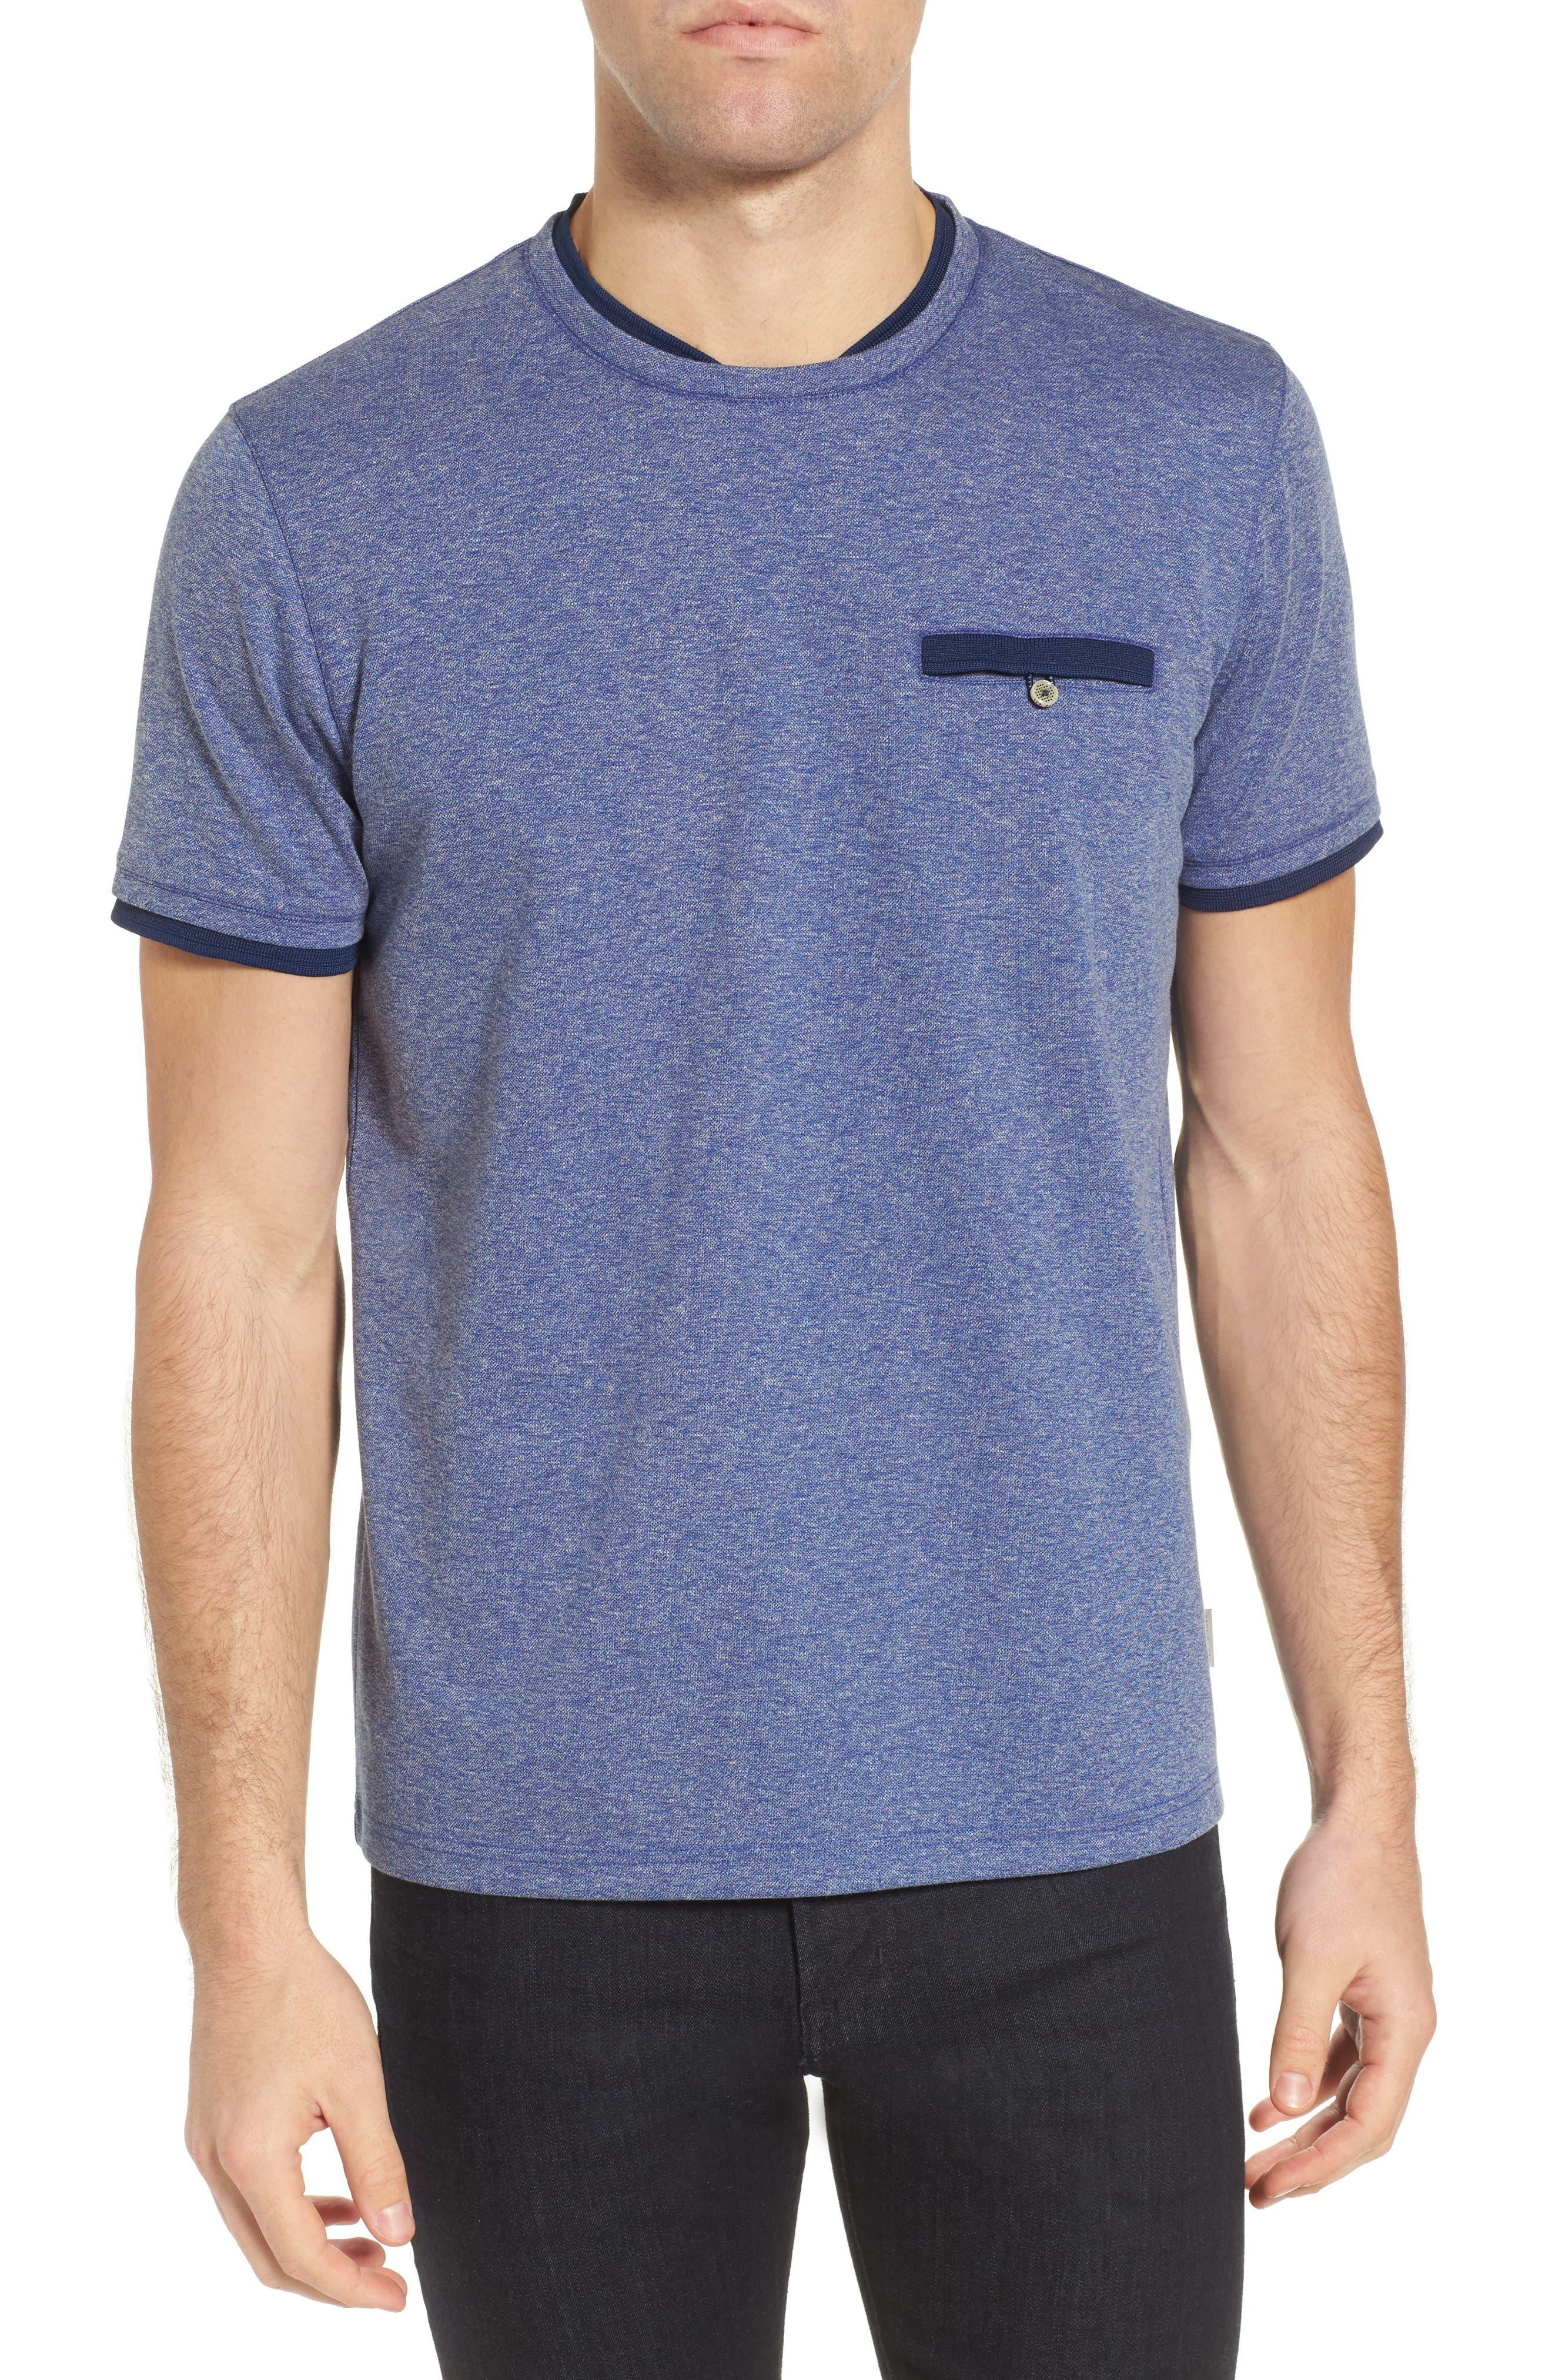 Main Image - Ted Baker London Climb Mouline Layered Pocket T-Shirt